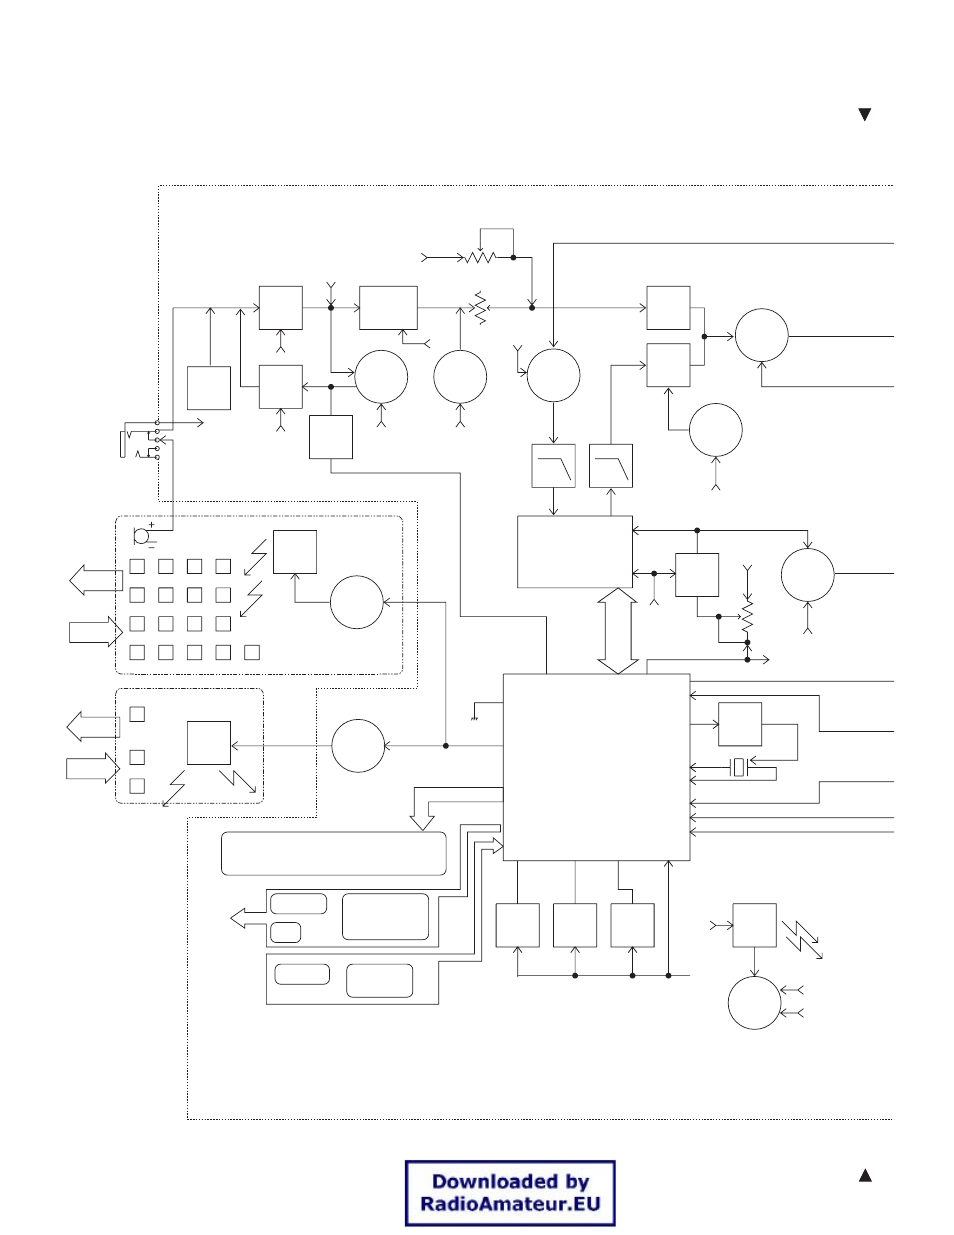 medium resolution of block diagram th k2at k2e k2et kenwood 144mhz fm transceiver k2e user manual page 59 63